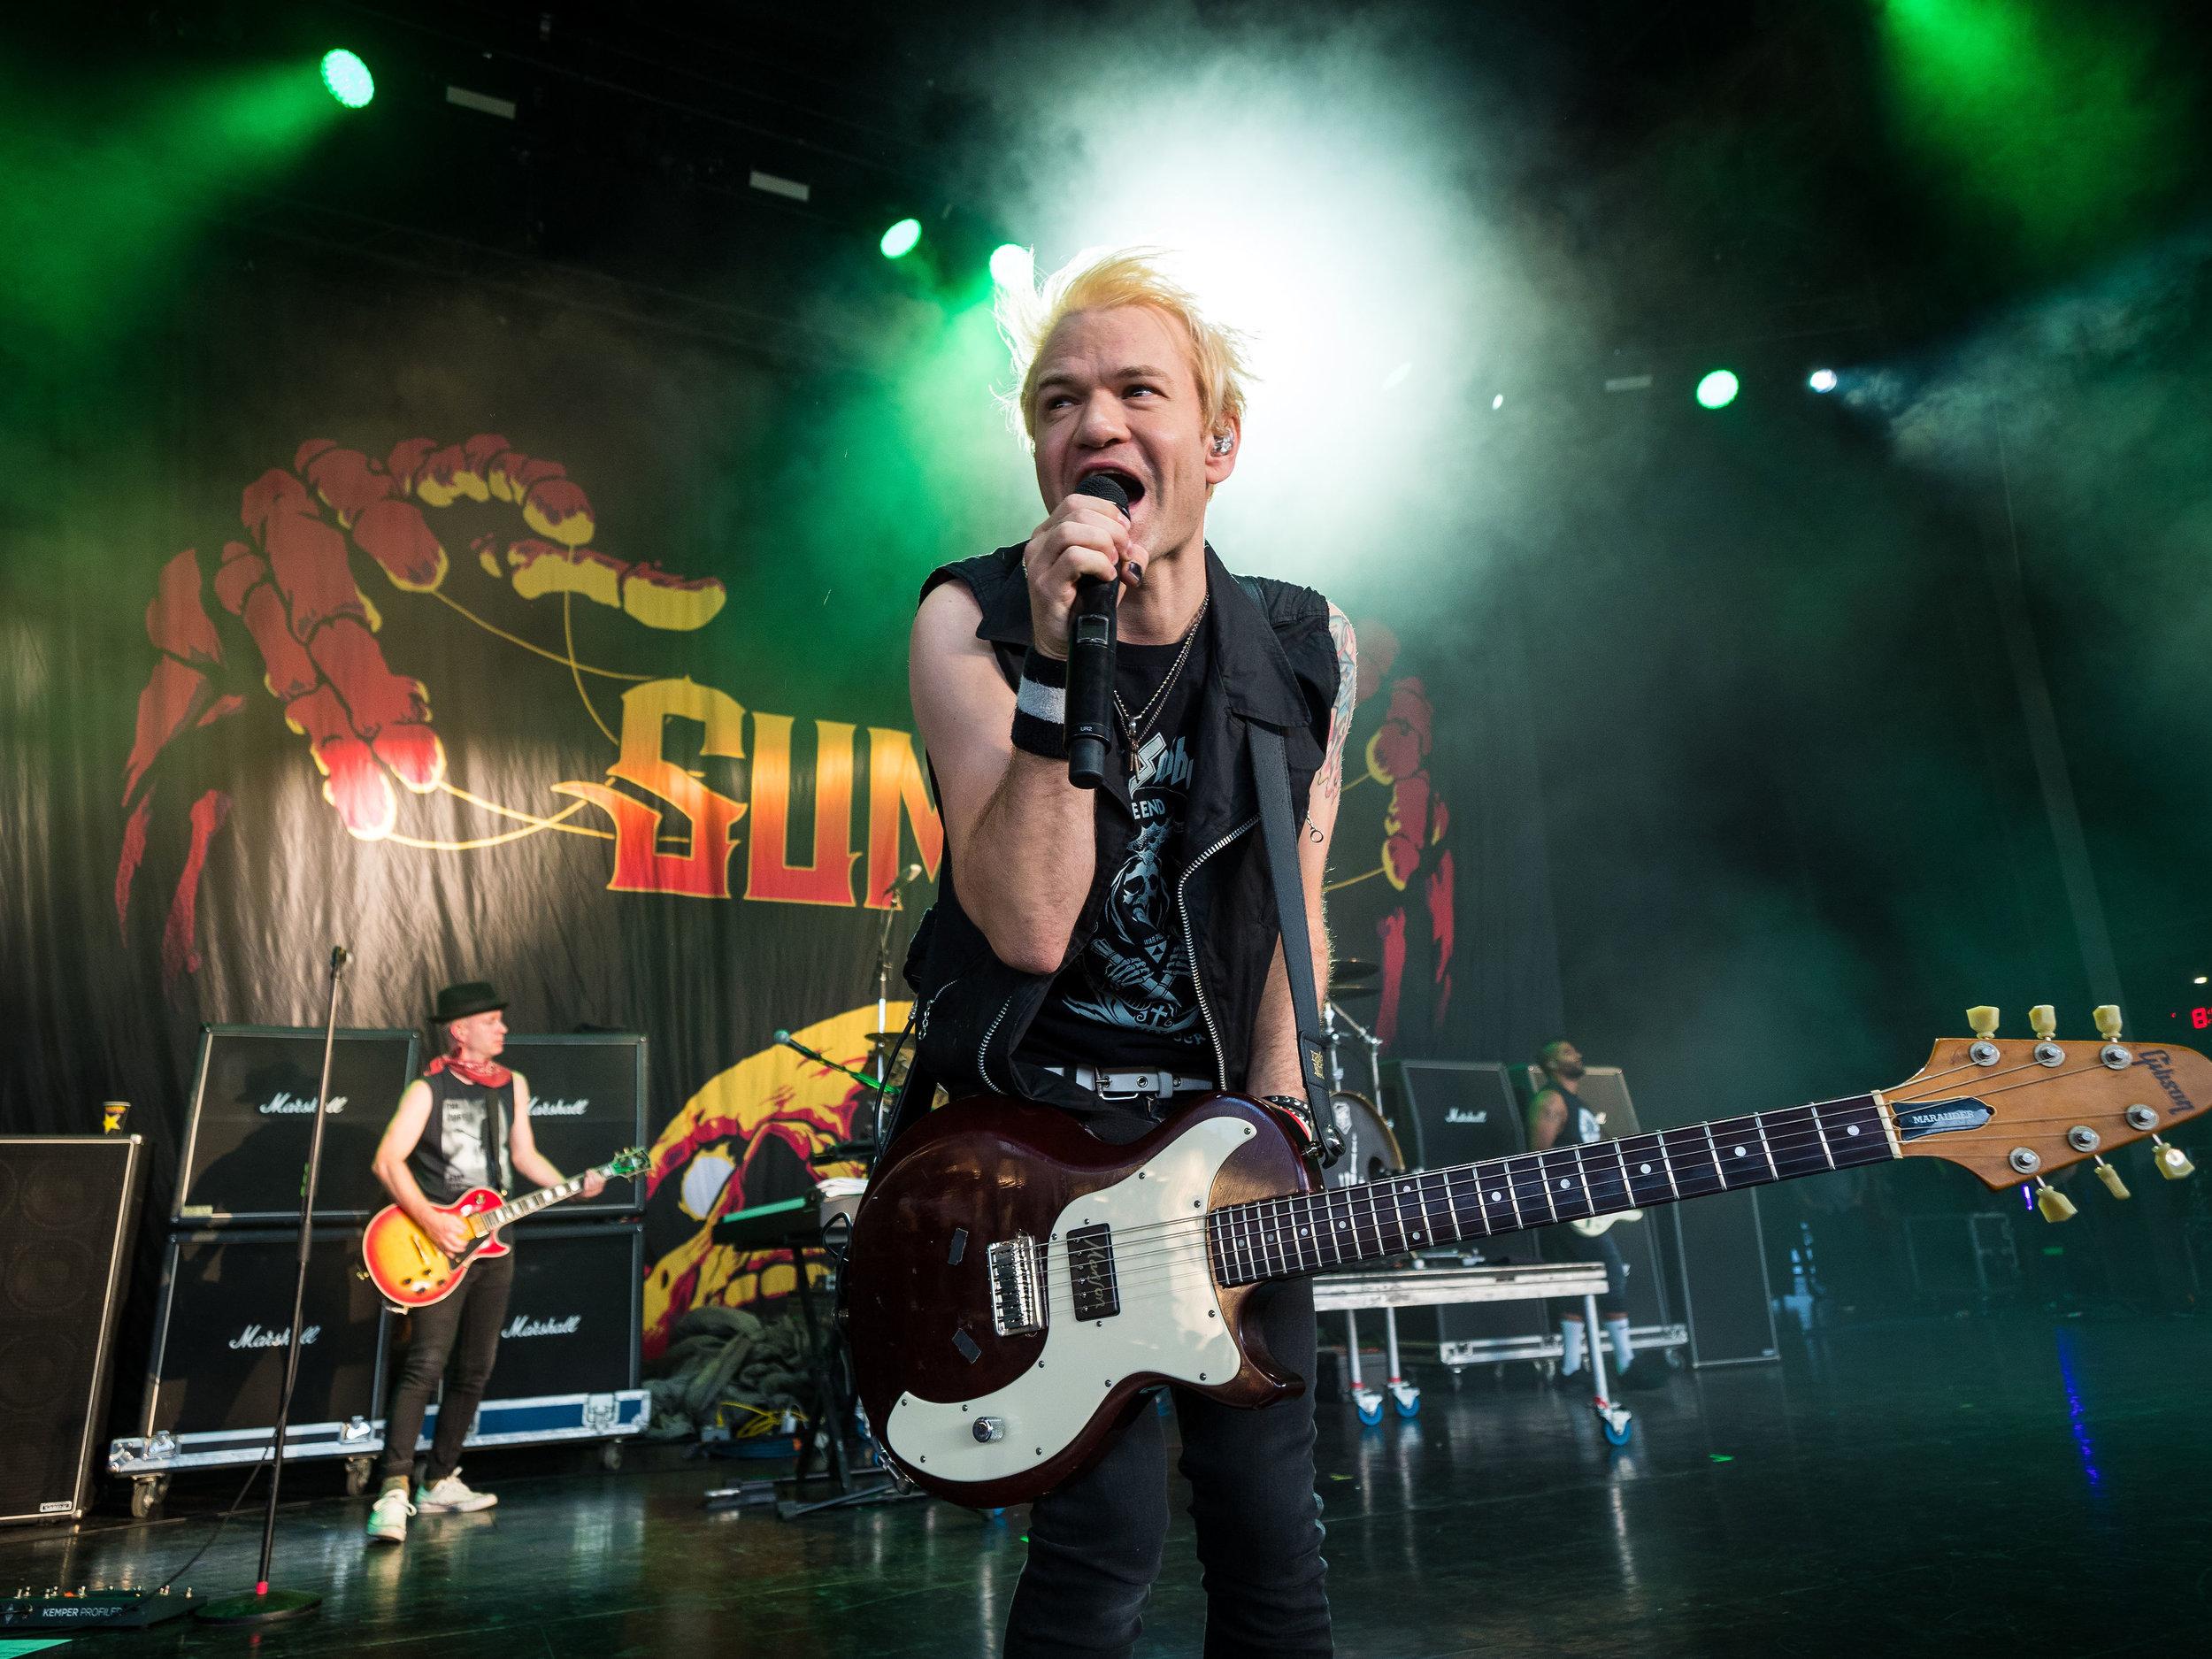 Sum 41     //   Rockstar Energy DISRUPT Festival   // 2019-07-10 //   DTE Energy Music Theatre    -  Clarkston, MI // Photos by  Brooke Elizabeth